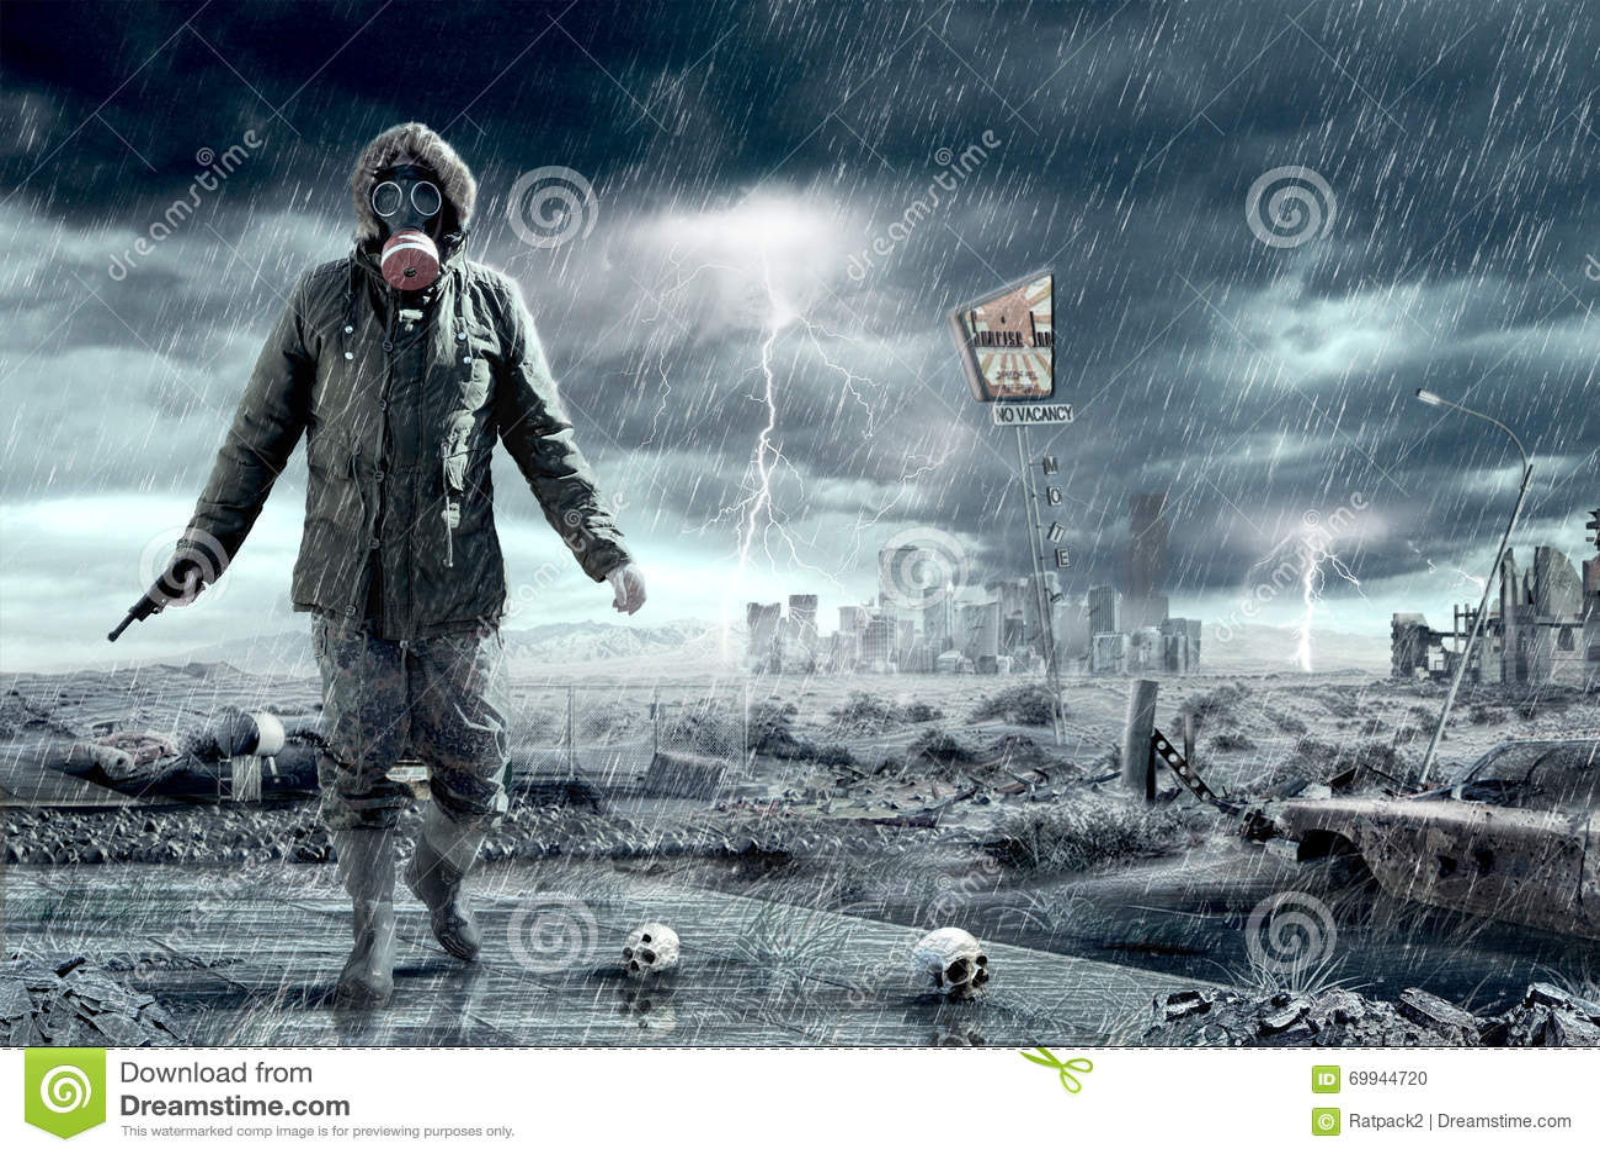 Tag Des Jüngsten Gerichts Apocalypsen Szenario Stock Abbildung